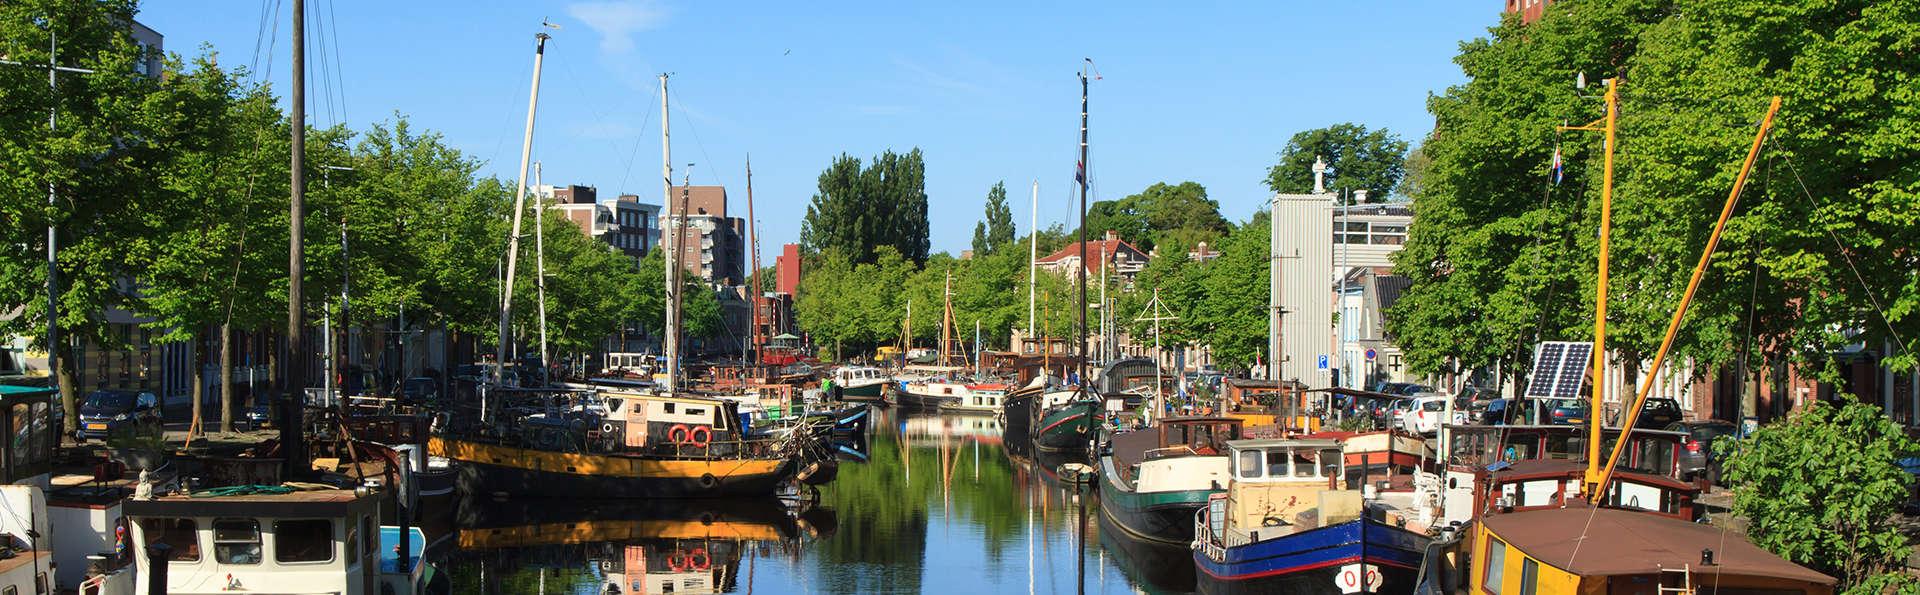 Apollo Hotel Groningen - EDIT_GRONINGEN.jpg